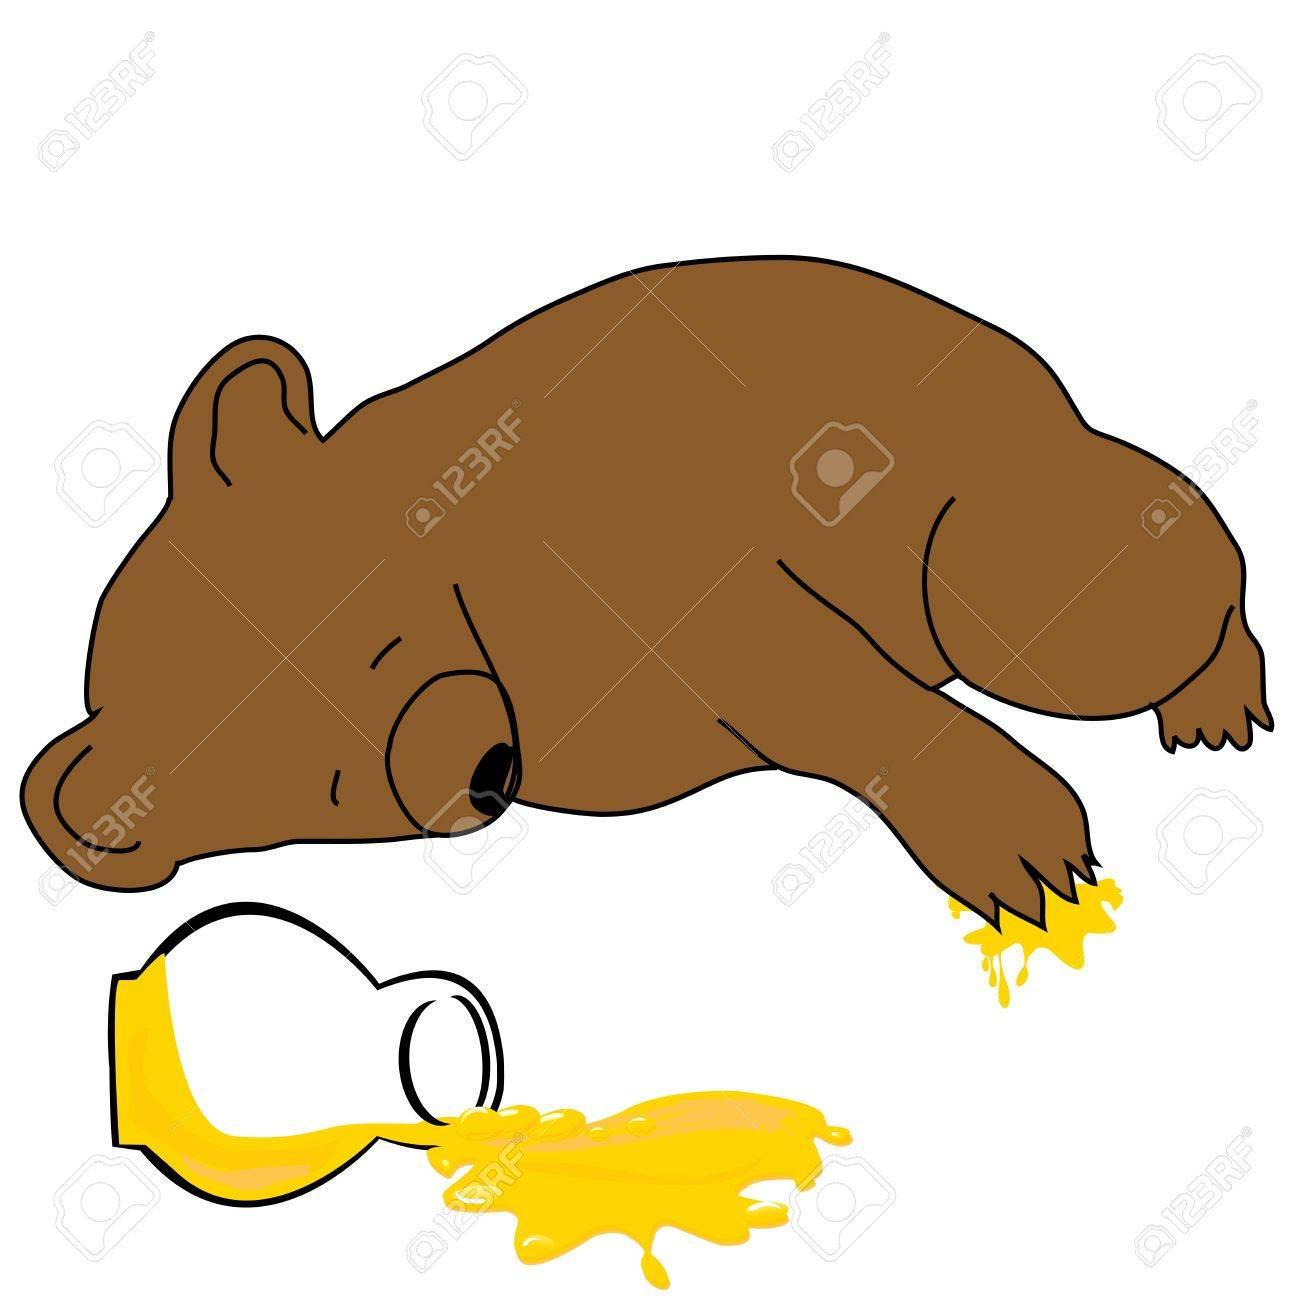 1300x1300 Sleeping Bear With A Jar Of Honey Royalty Free Cliparts, Vectors